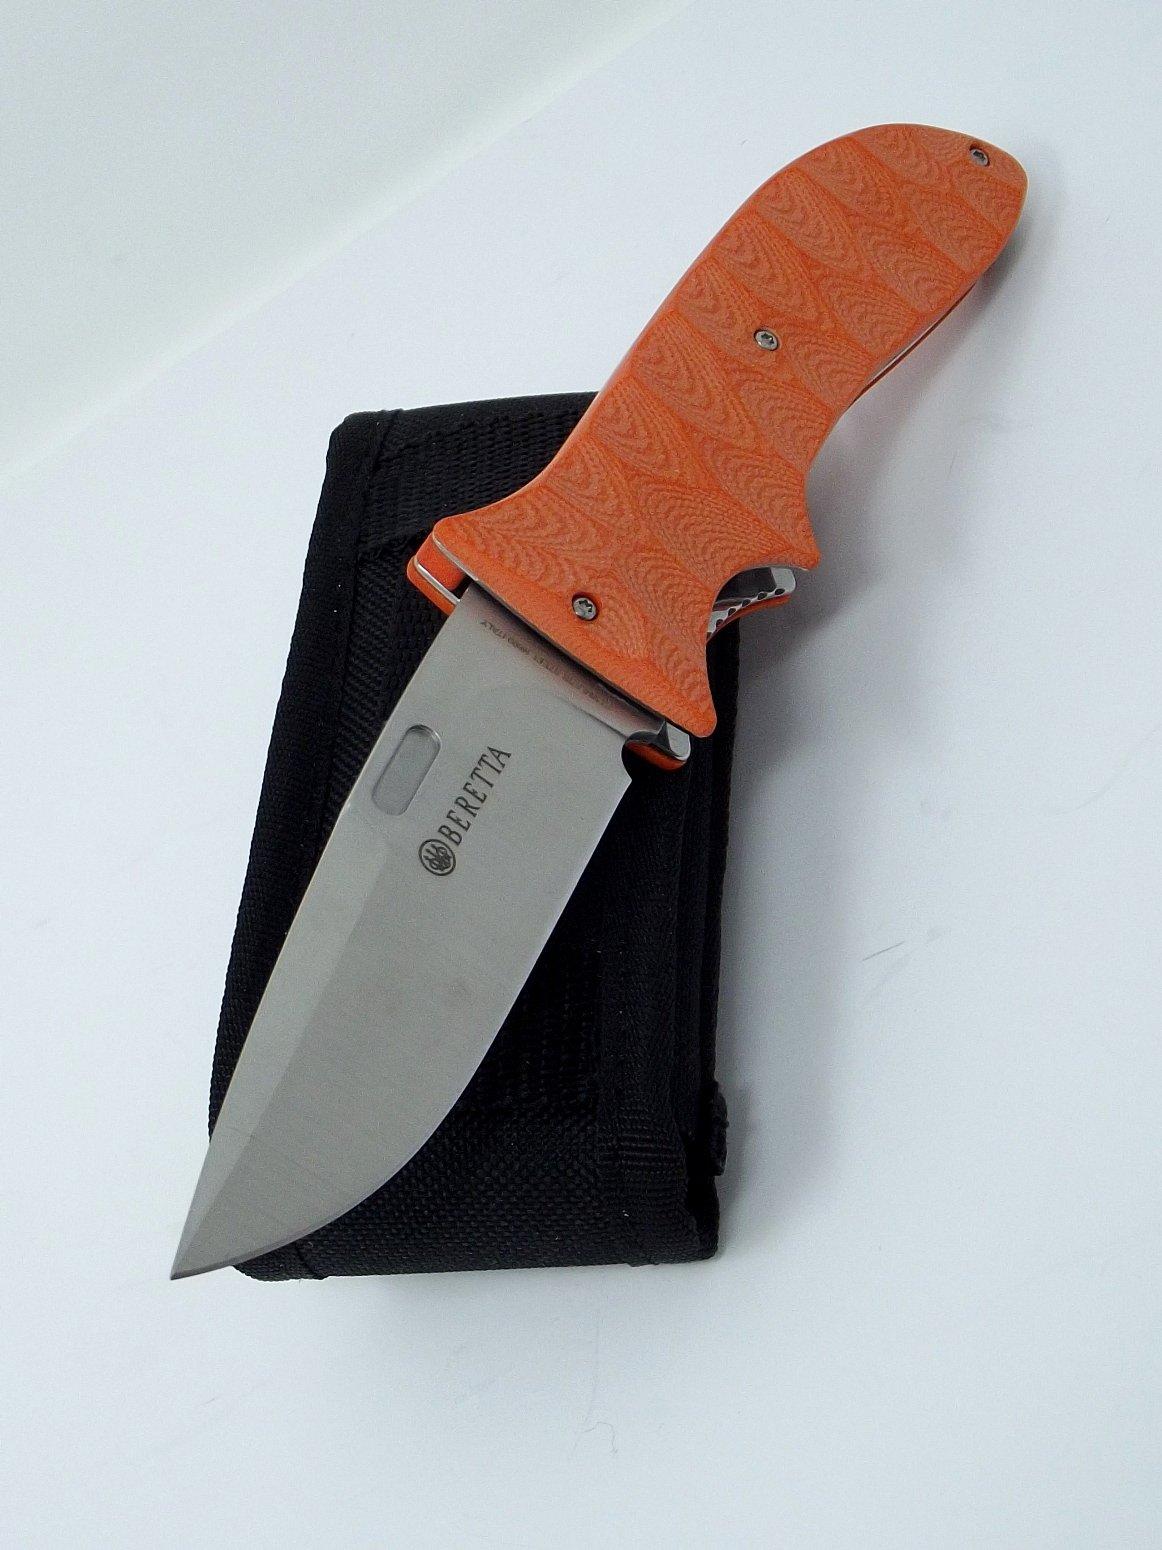 Maserin Made in Italy Beretta Pocketknife G10 Handle N690 Stainless Steel Blade Heavy Duty Belt Sheath